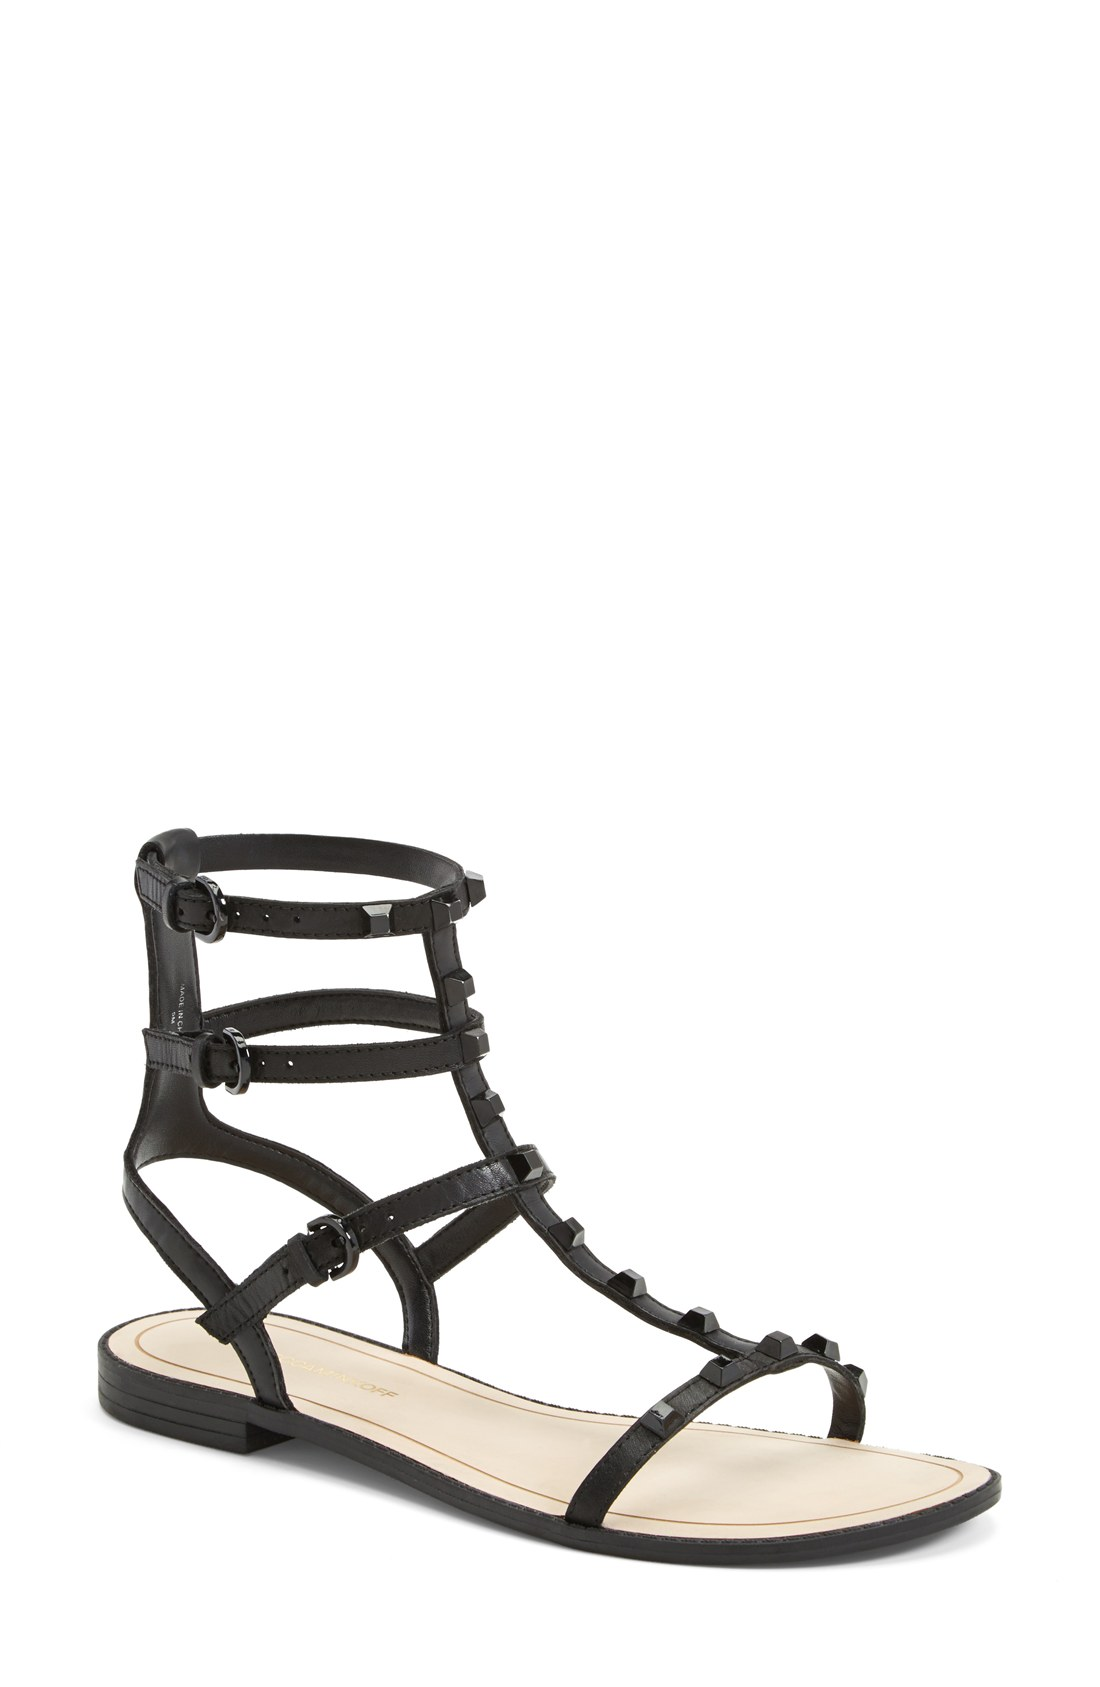 7f4896f5d Rebecca Minkoff 'Georgina' Studded Leather Sandal (Women) | Nordstrom